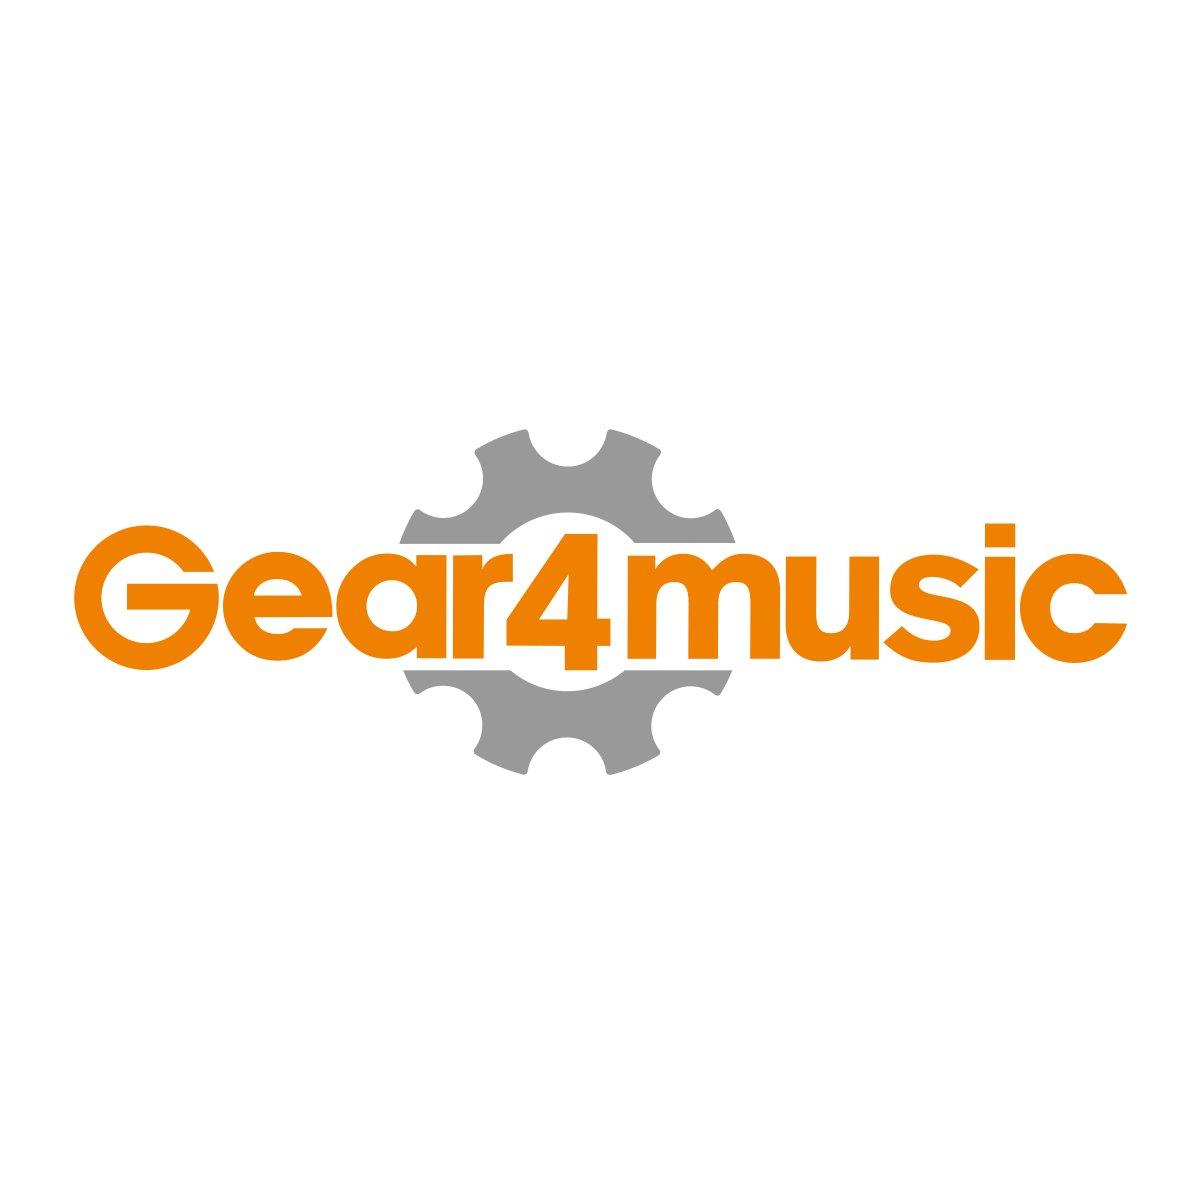 zildjian l80 low volume 18 crash ride cymbal at gear4music. Black Bedroom Furniture Sets. Home Design Ideas